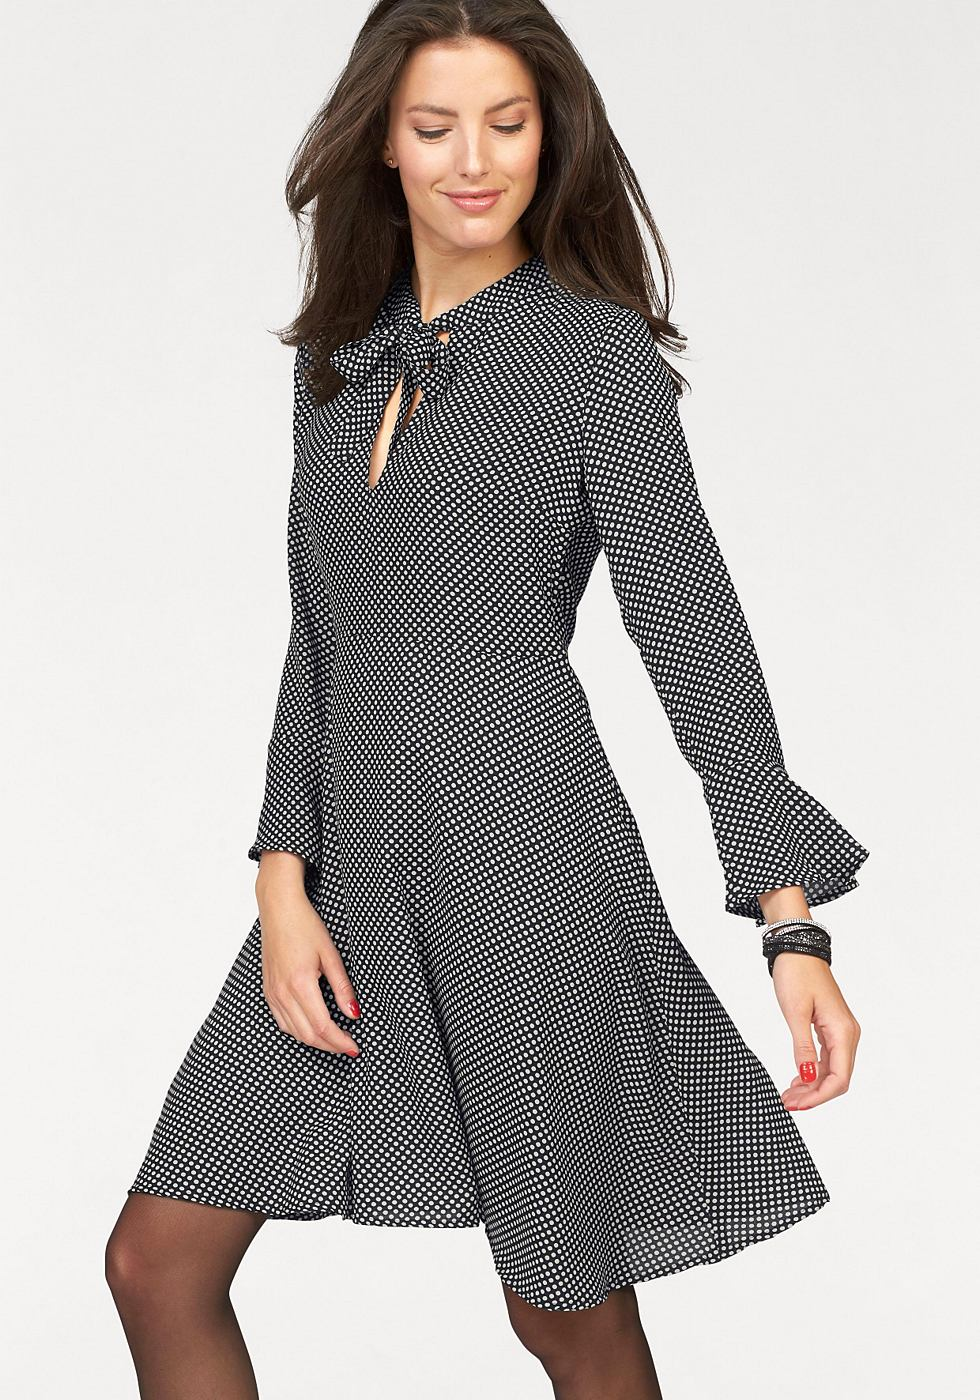 Vivance Collection gedessineerde jurk zwart